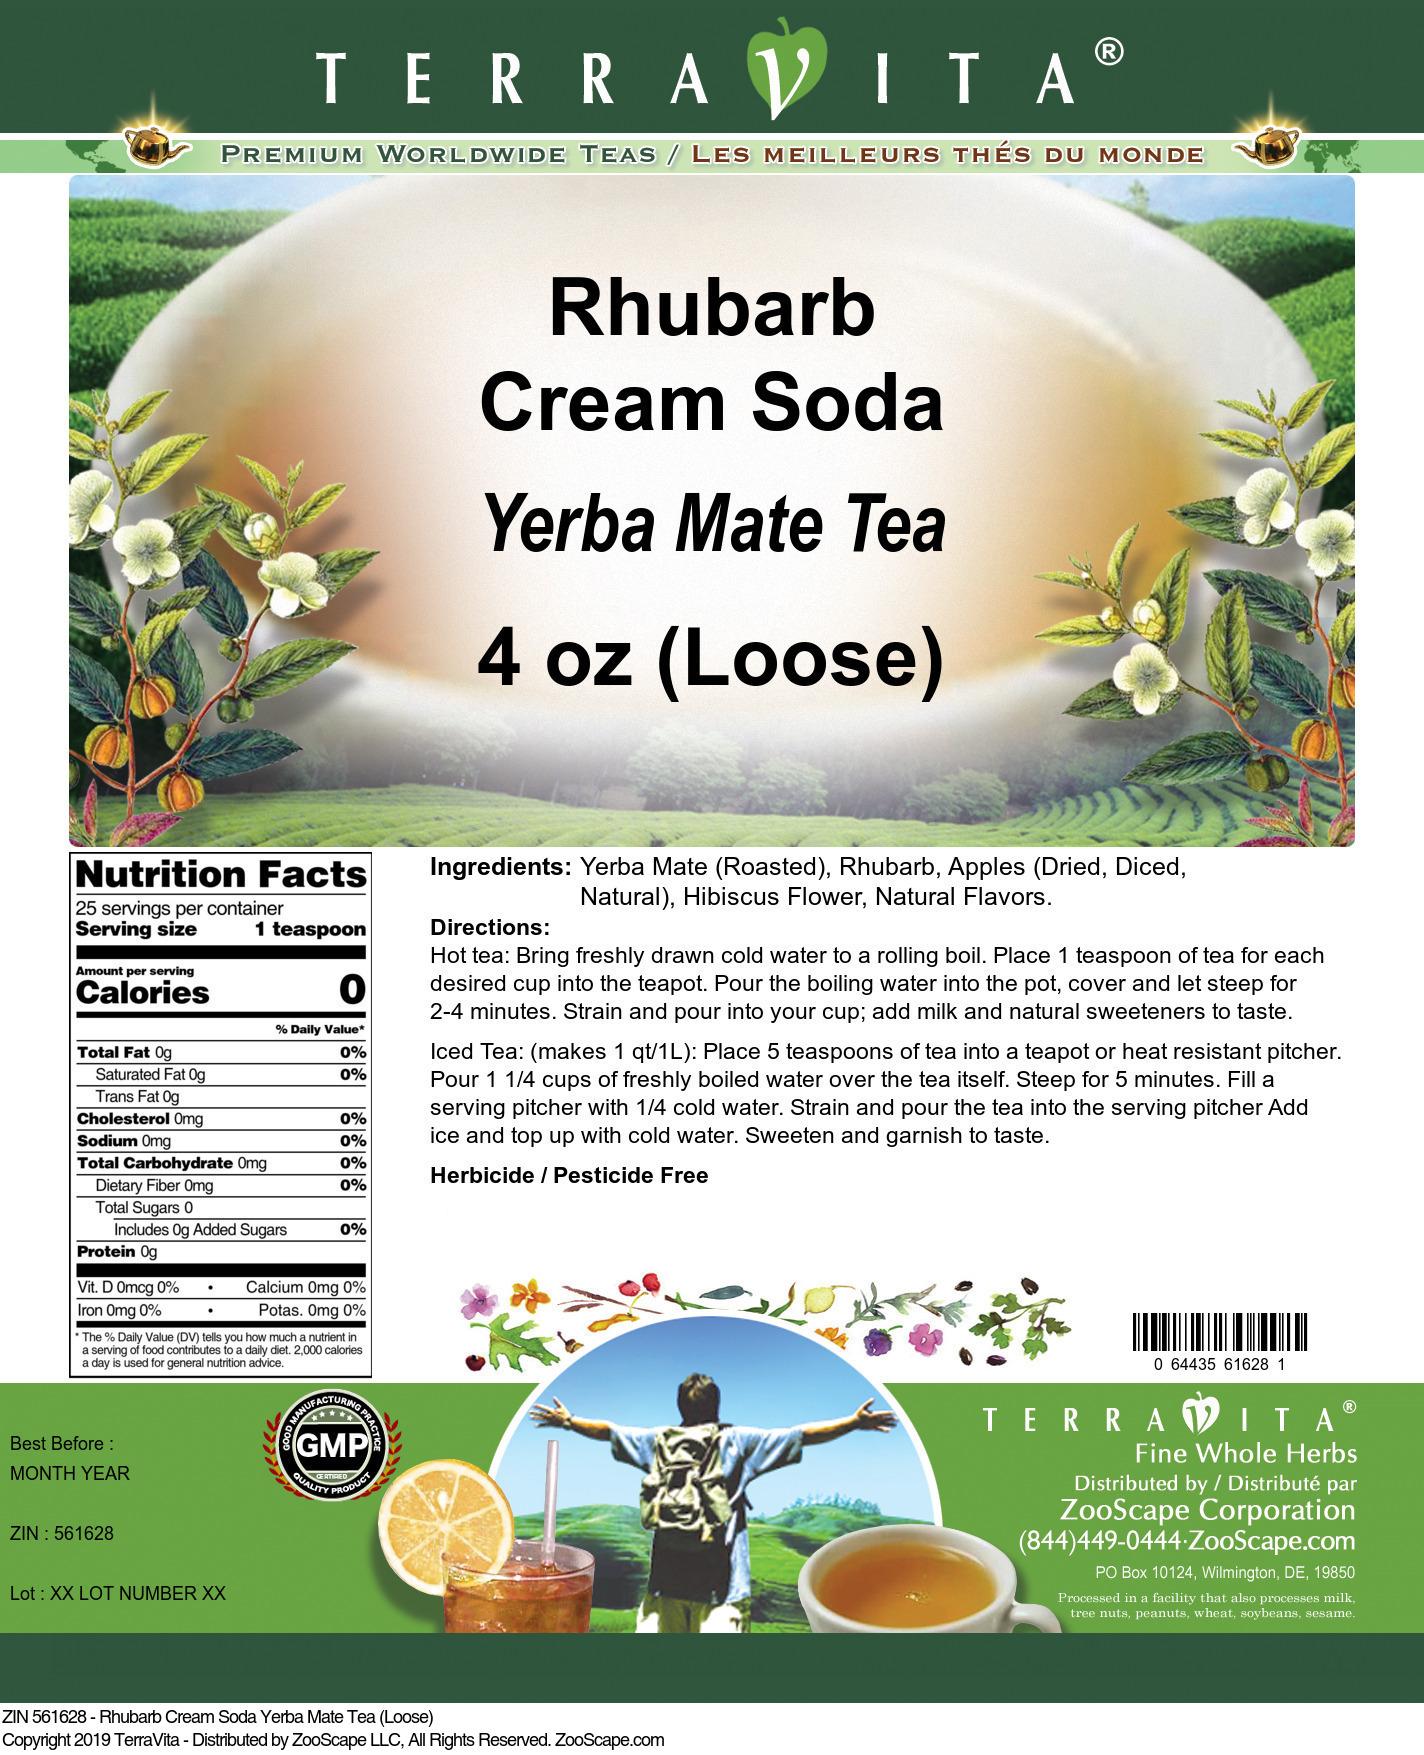 Rhubarb Cream Soda Yerba Mate